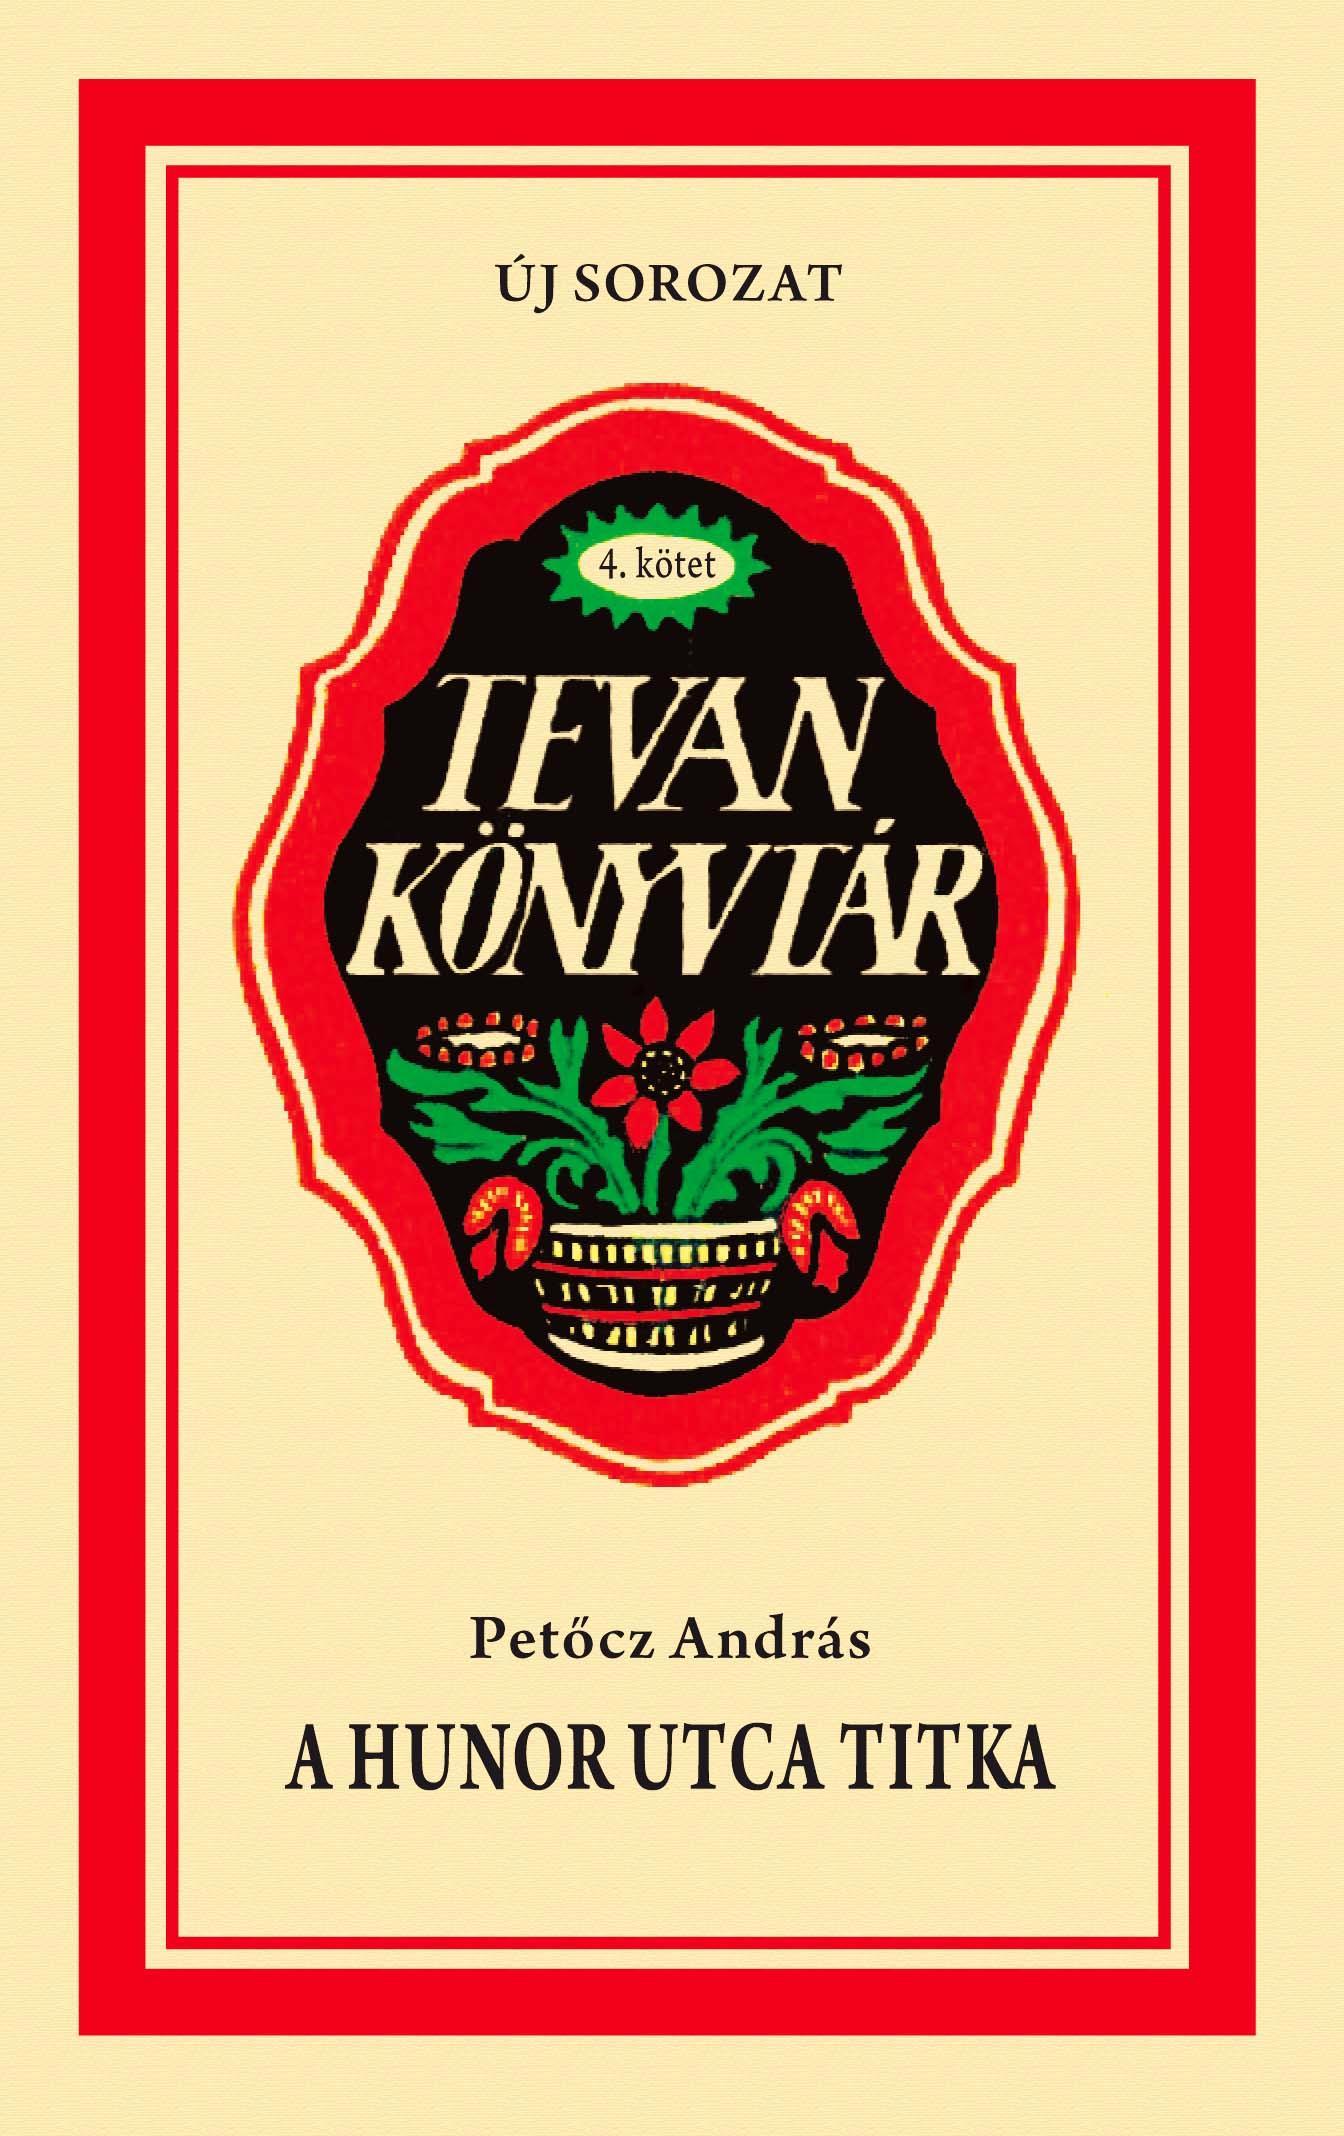 A HUNOR UTCA TITKA - TEVAN KÖNYVTÁR